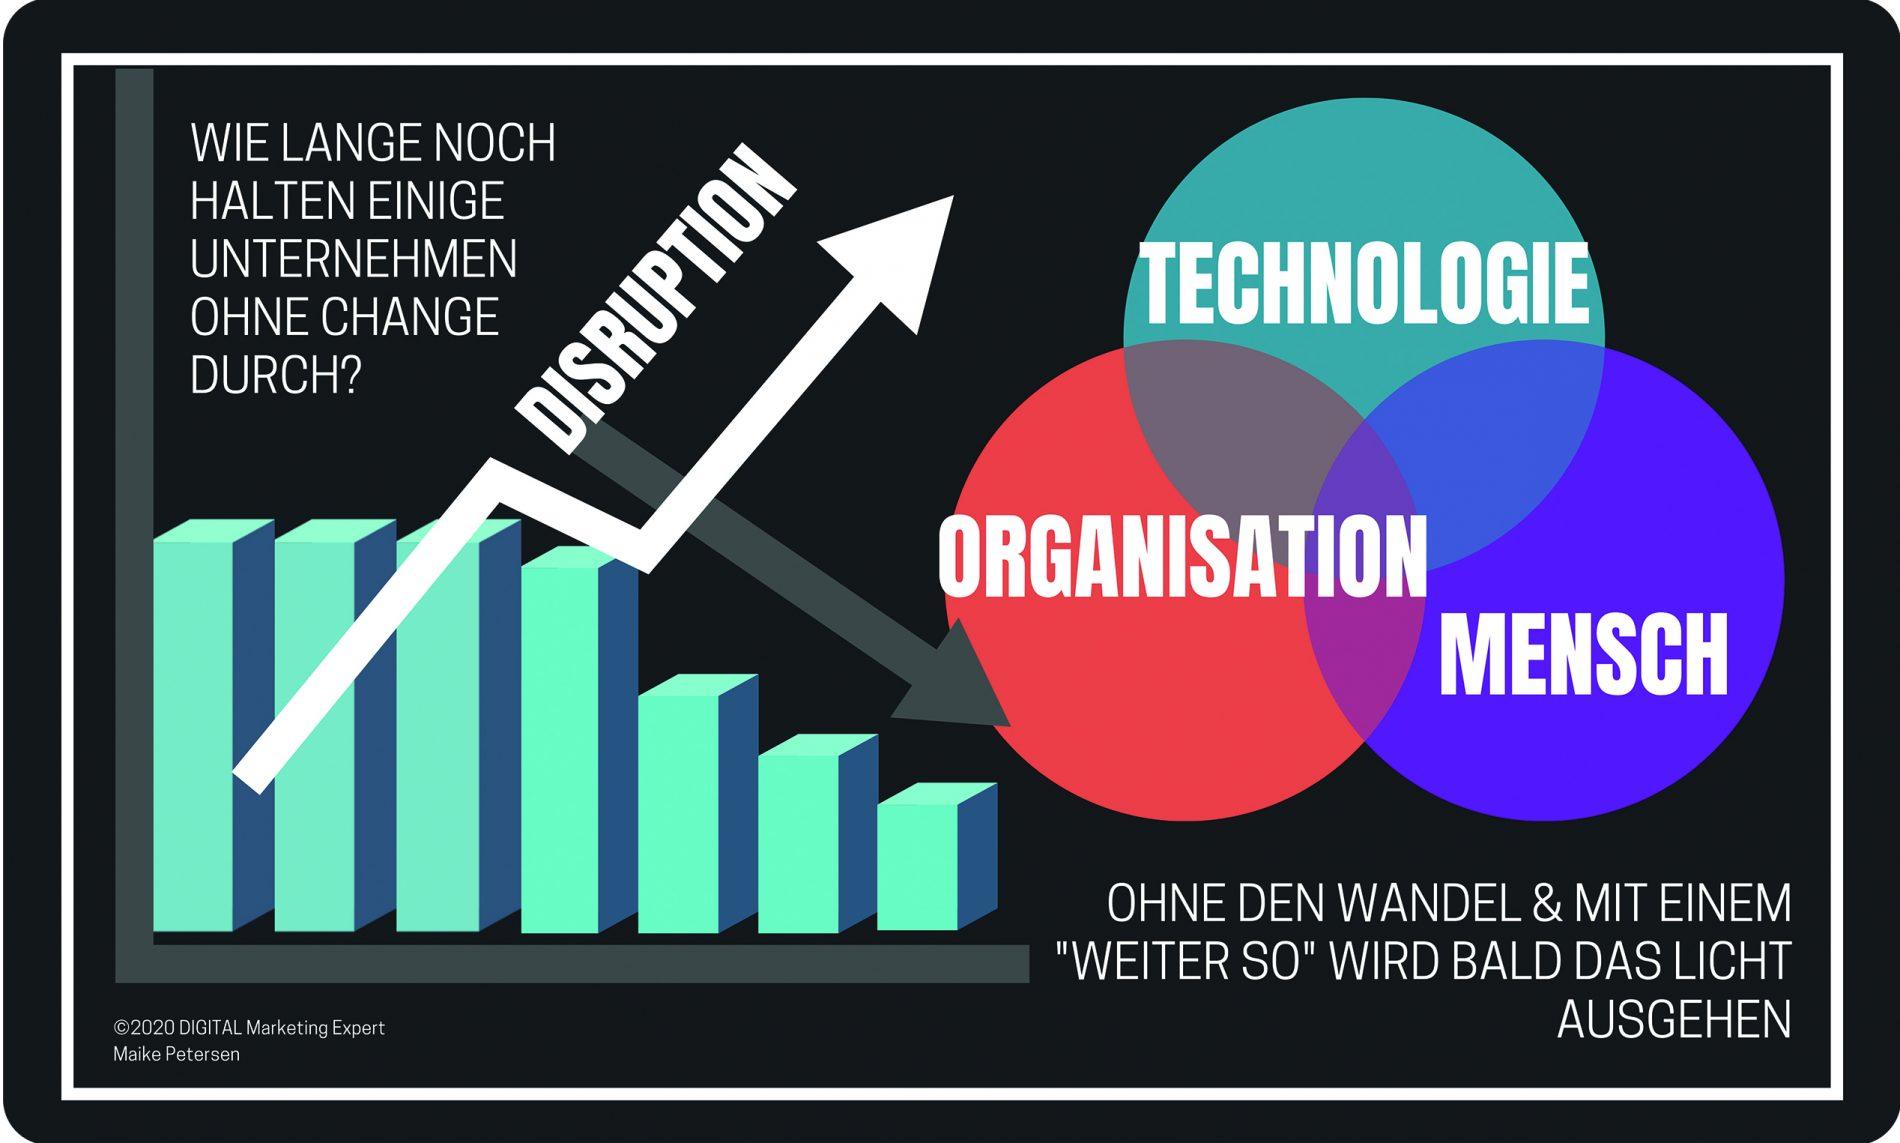 Disruption - Digitale Transformation - ROCK YOUR DIGITAL BUSINESS - Buch Maike Petersen